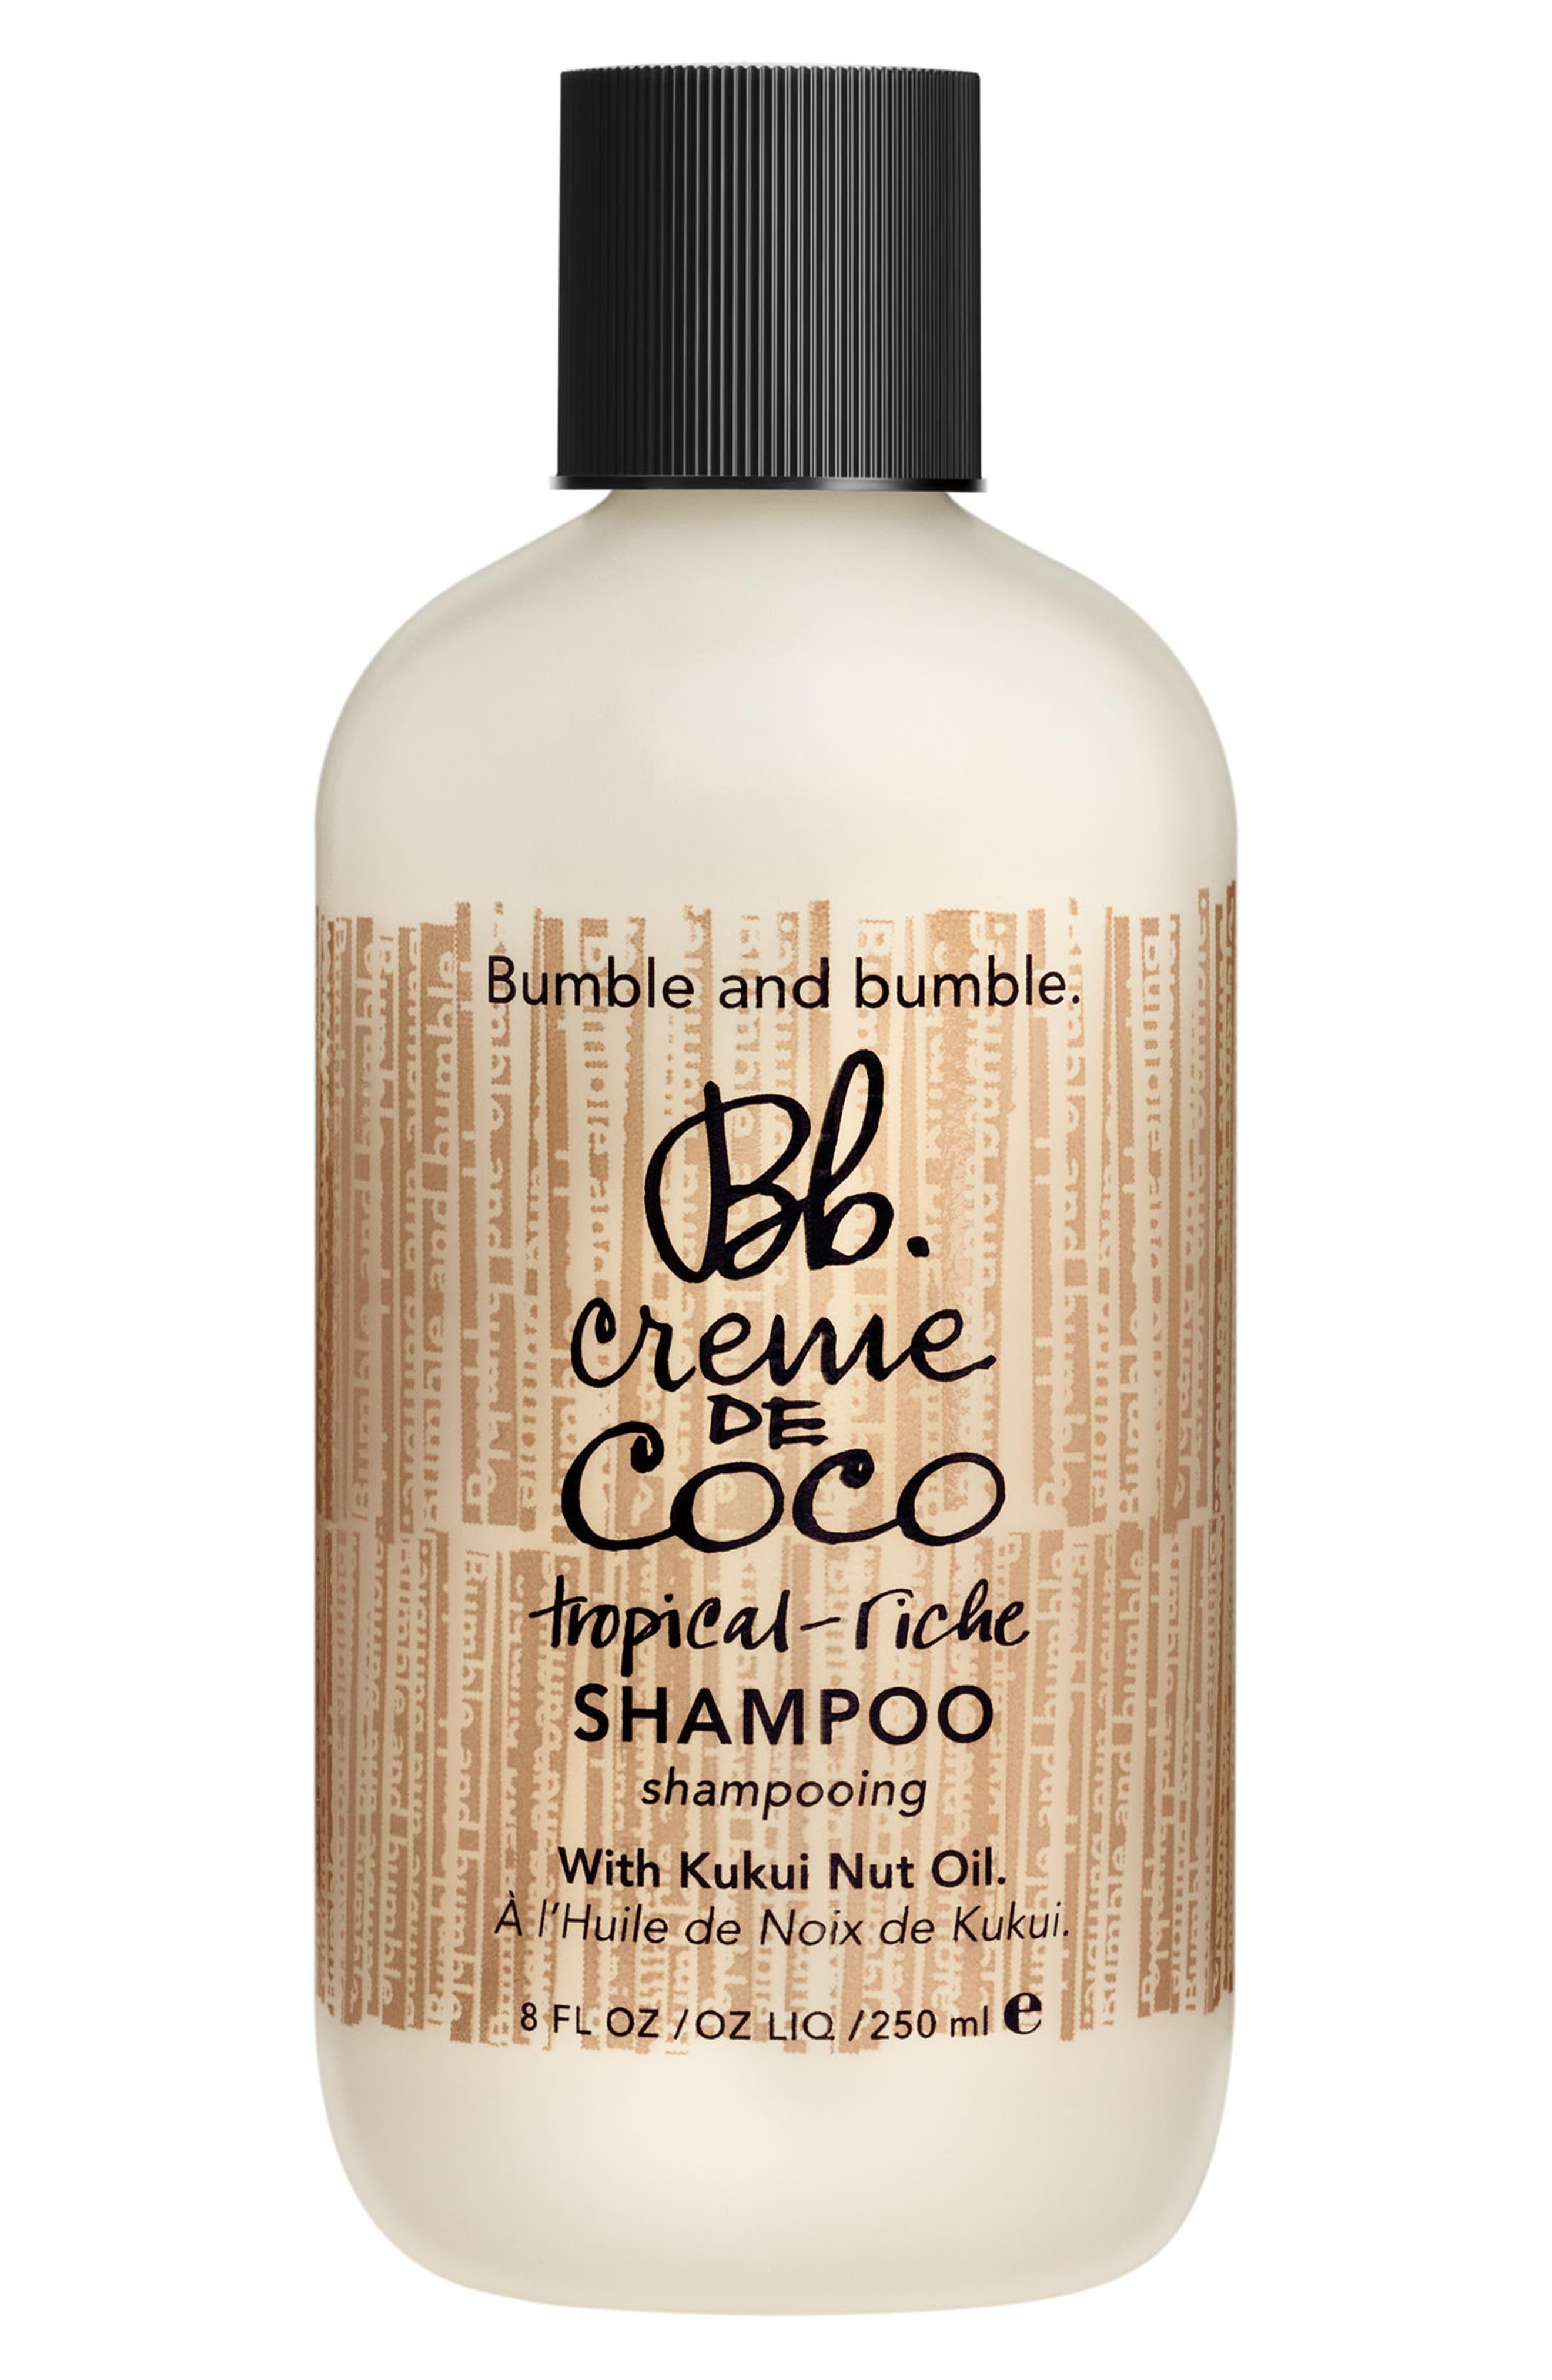 BUMBLE AND BUMBLE. Bumble and bumble Creme de Coco Shampoo, Main, color, NO COLOR